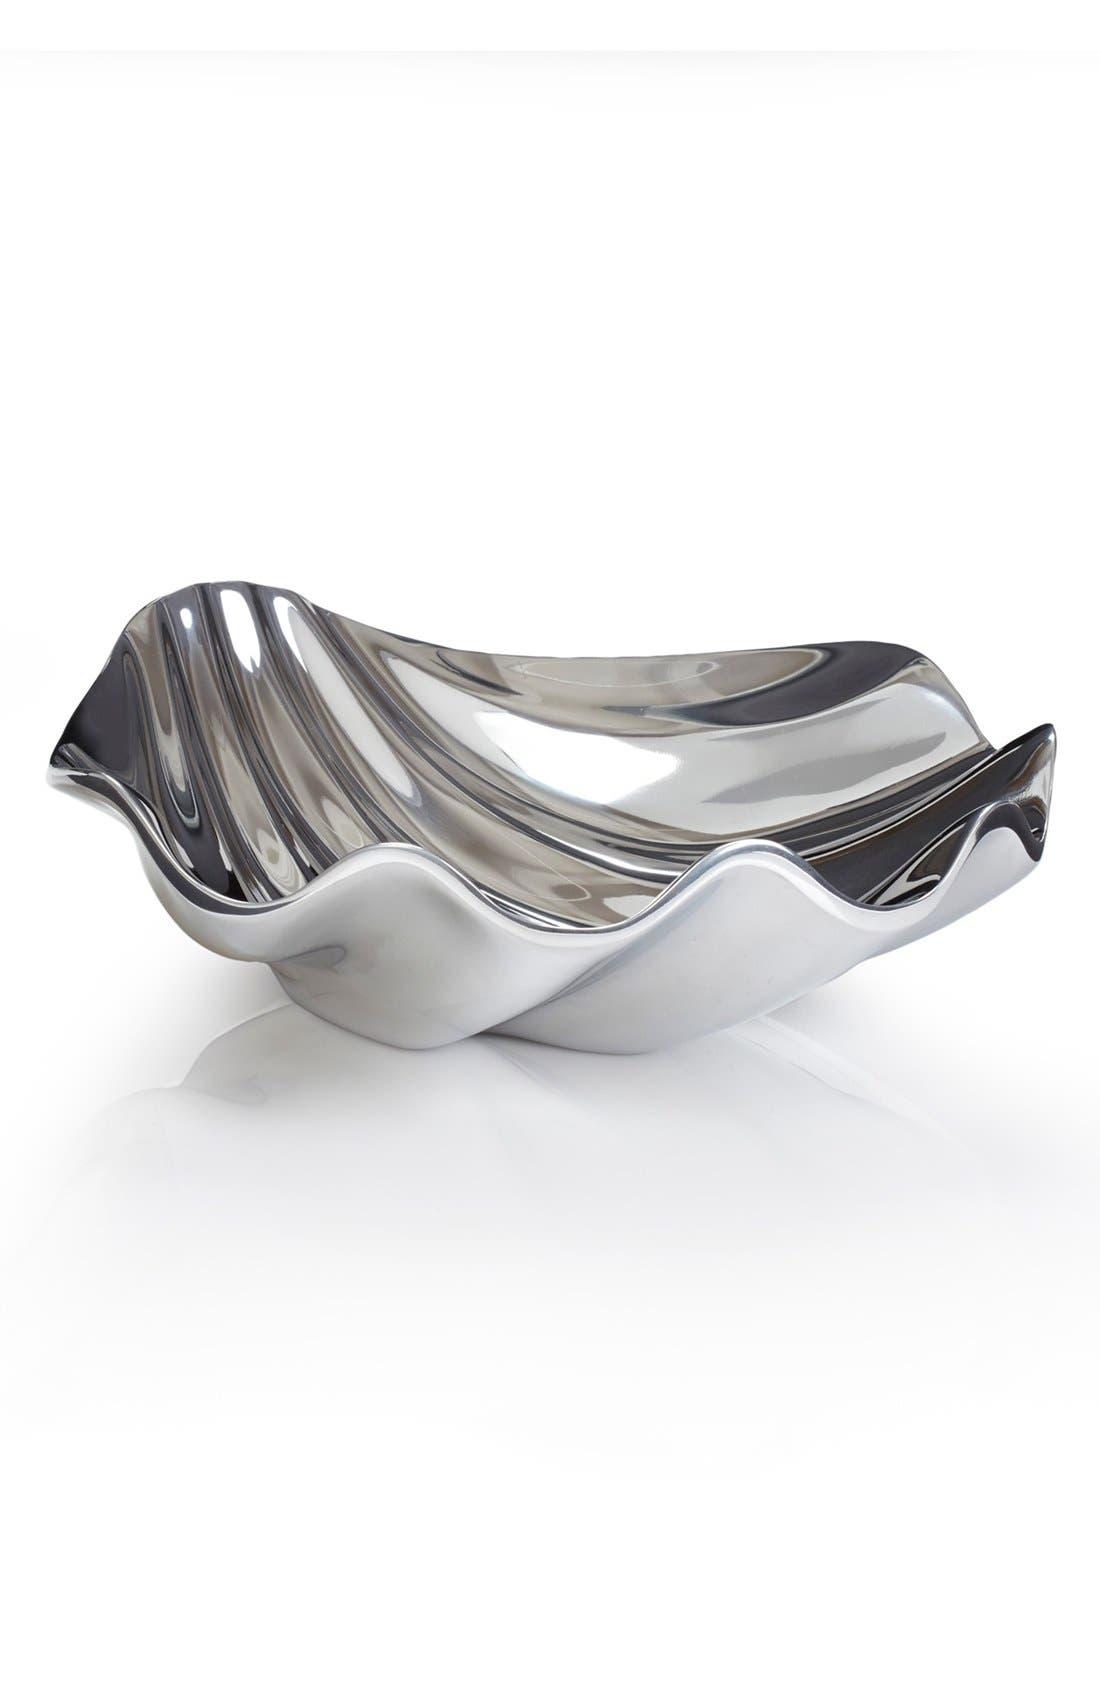 Nambé 'Oceana' Seashell Bowl